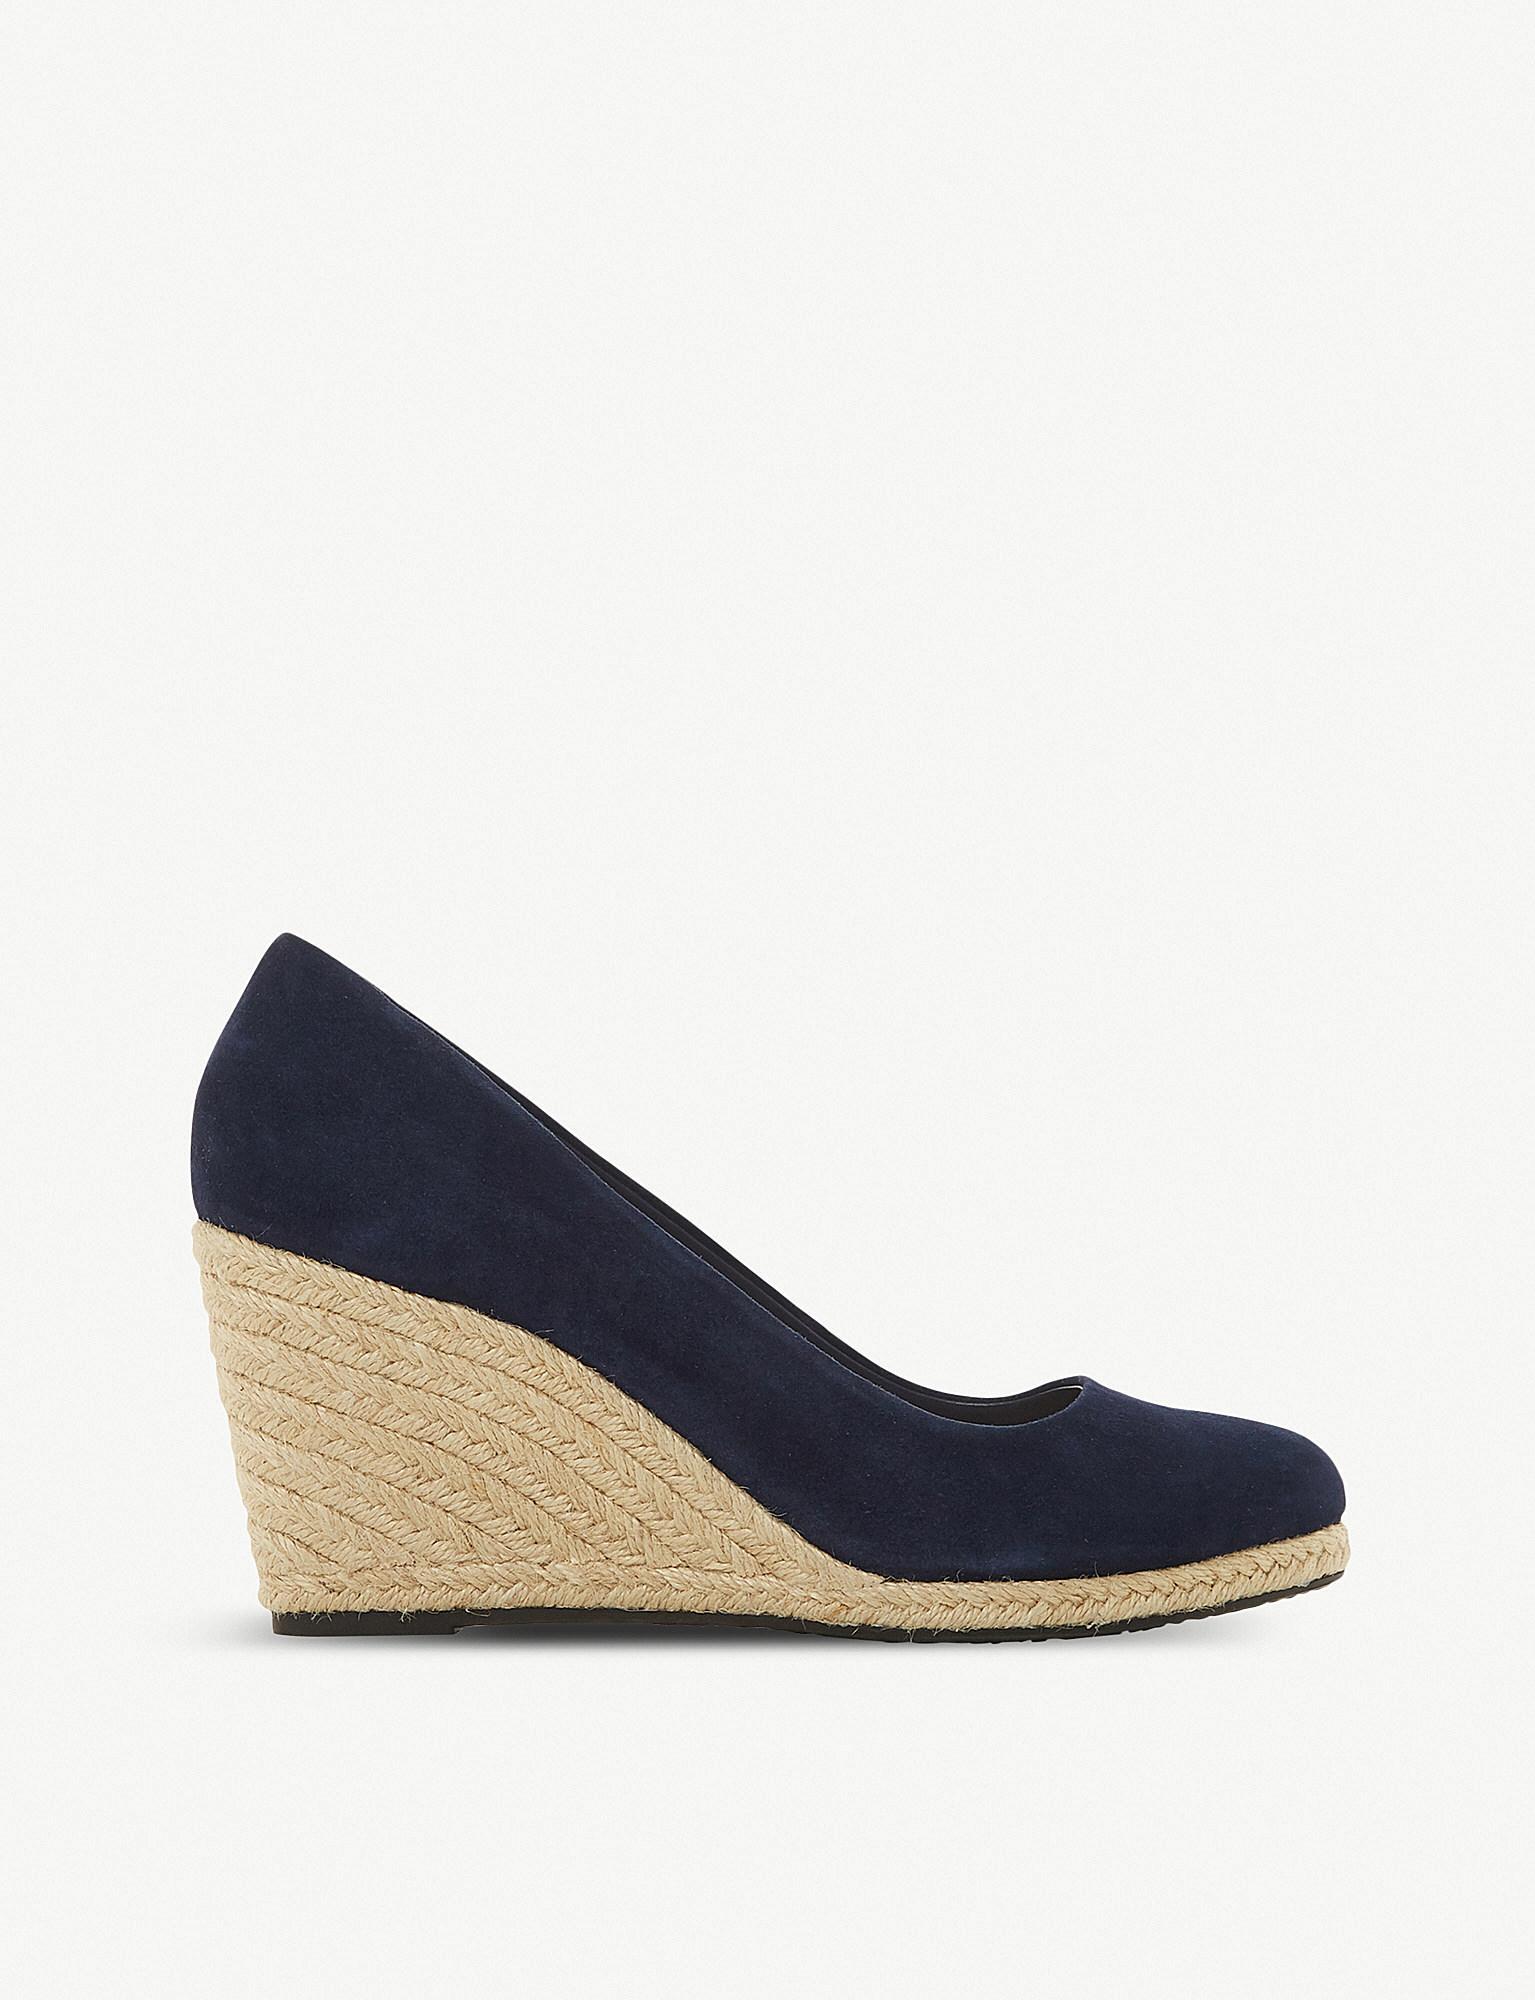 8125612e74cfa Dune Annabella Espadrille Wedge Sandals in Blue - Lyst